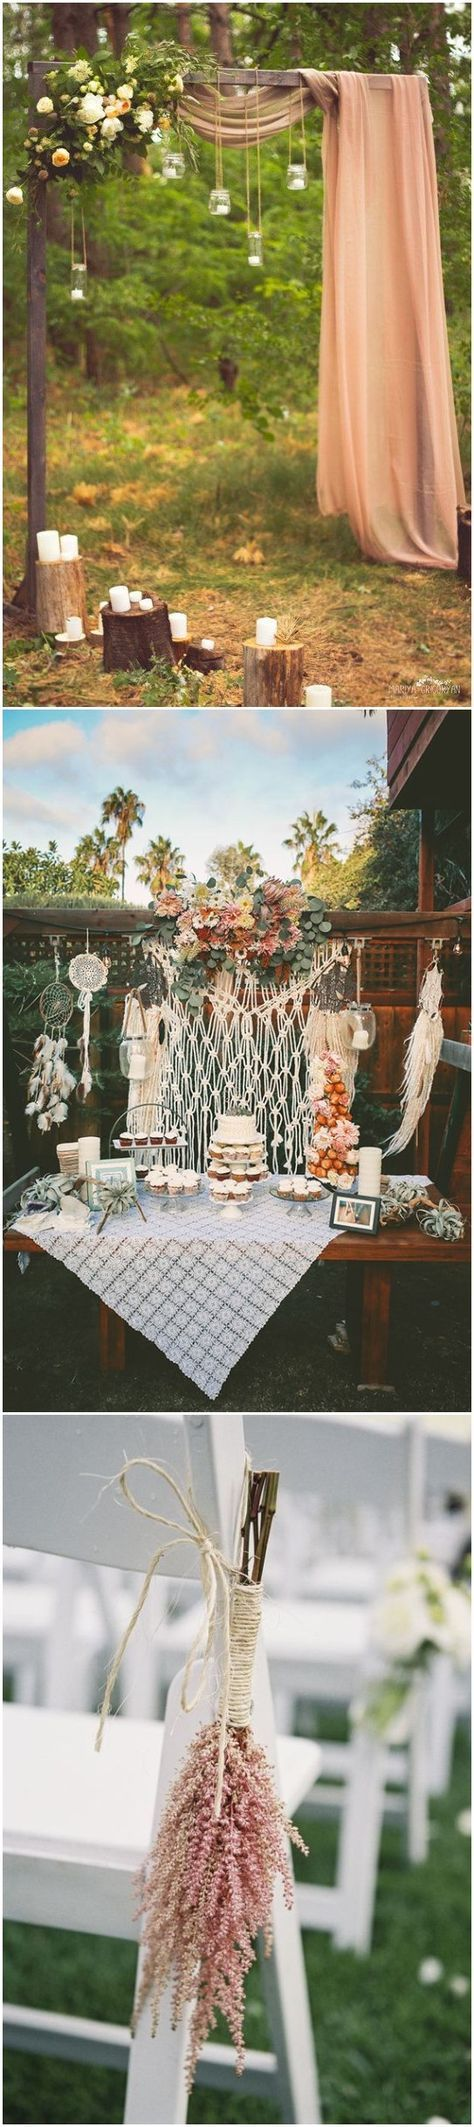 best 25 garden party wedding ideas on pinterest garden parties